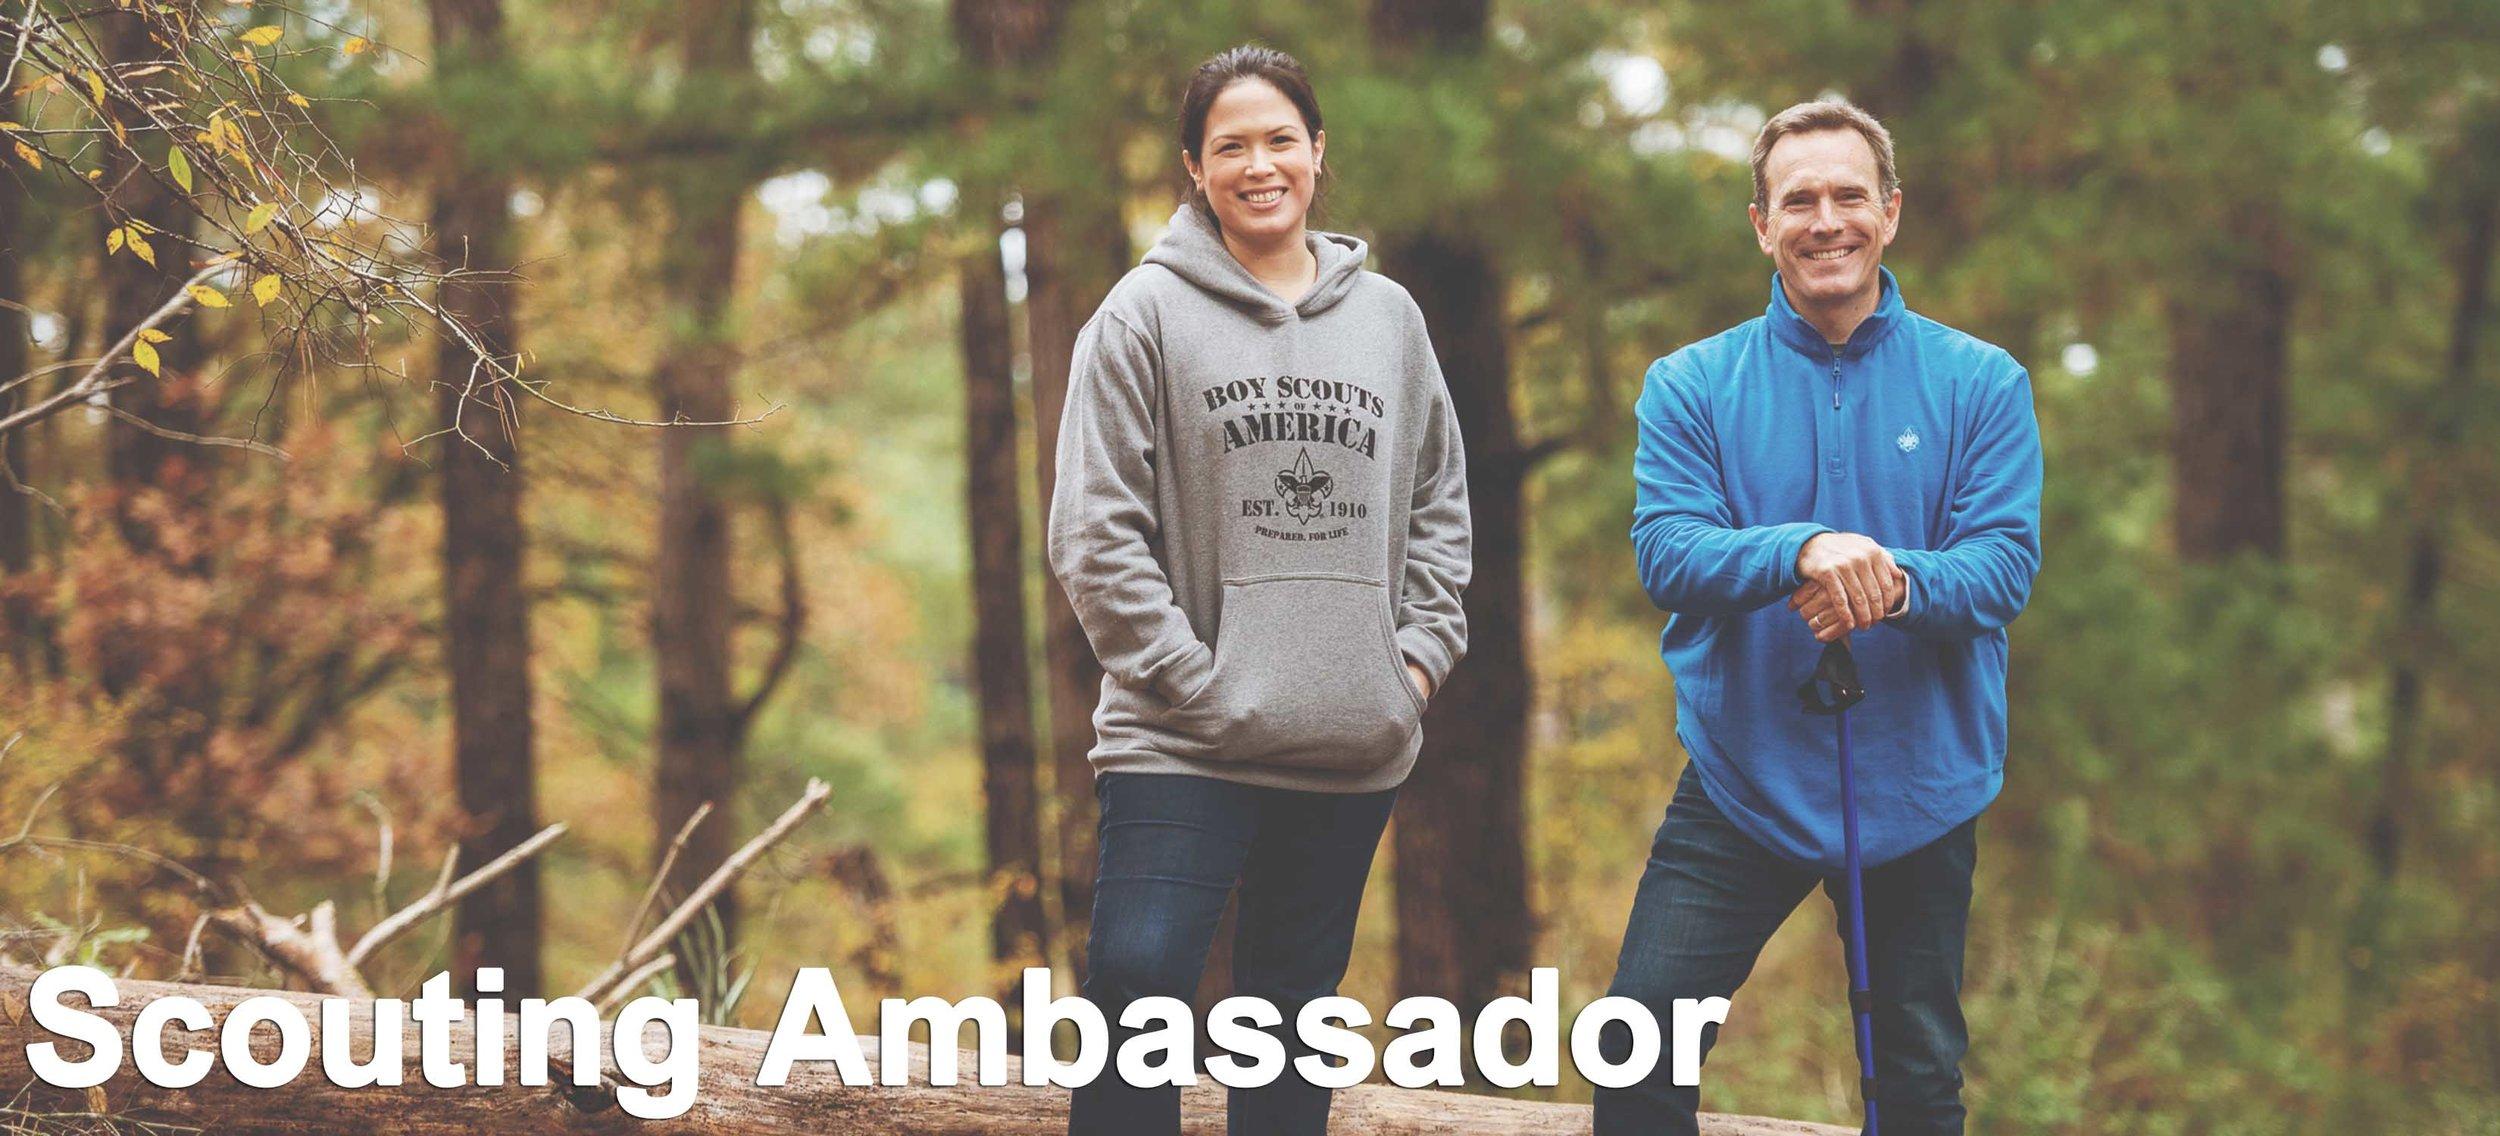 scouting ambassador banner low res.jpg